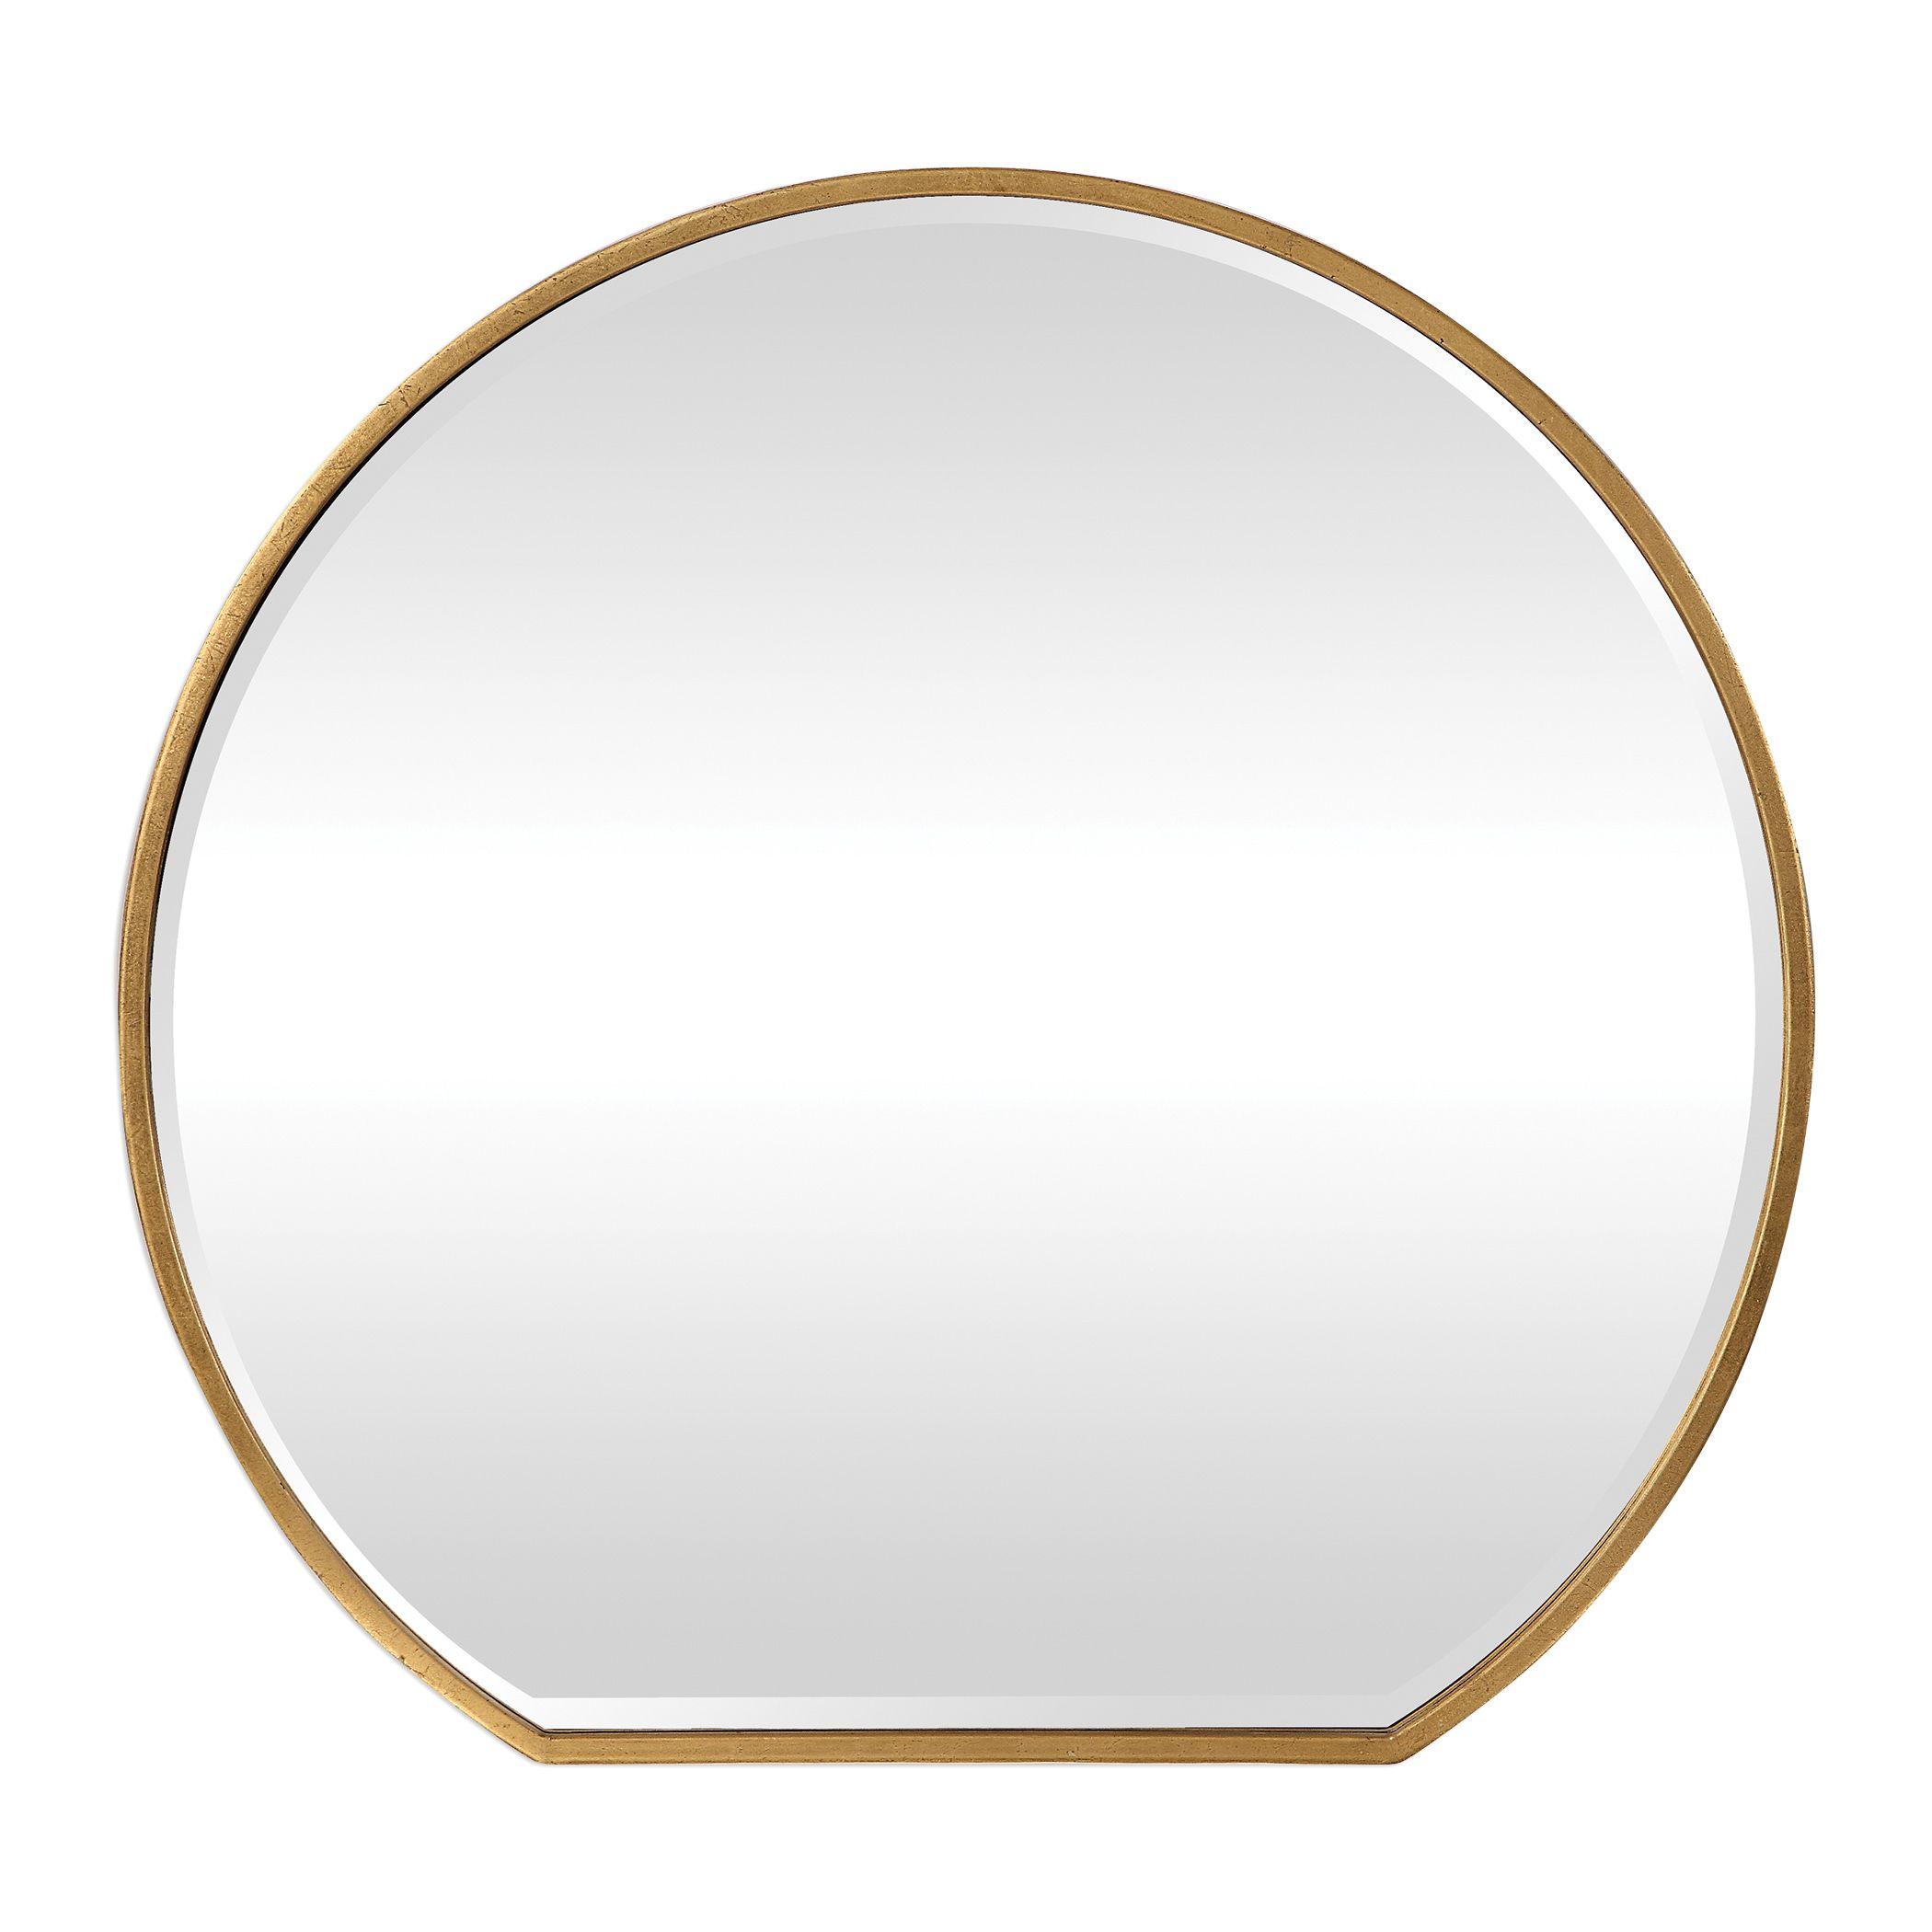 Alexandra Mirror Gold Gold Mirror Wall Hanging Wall Mirror Mirror Wall